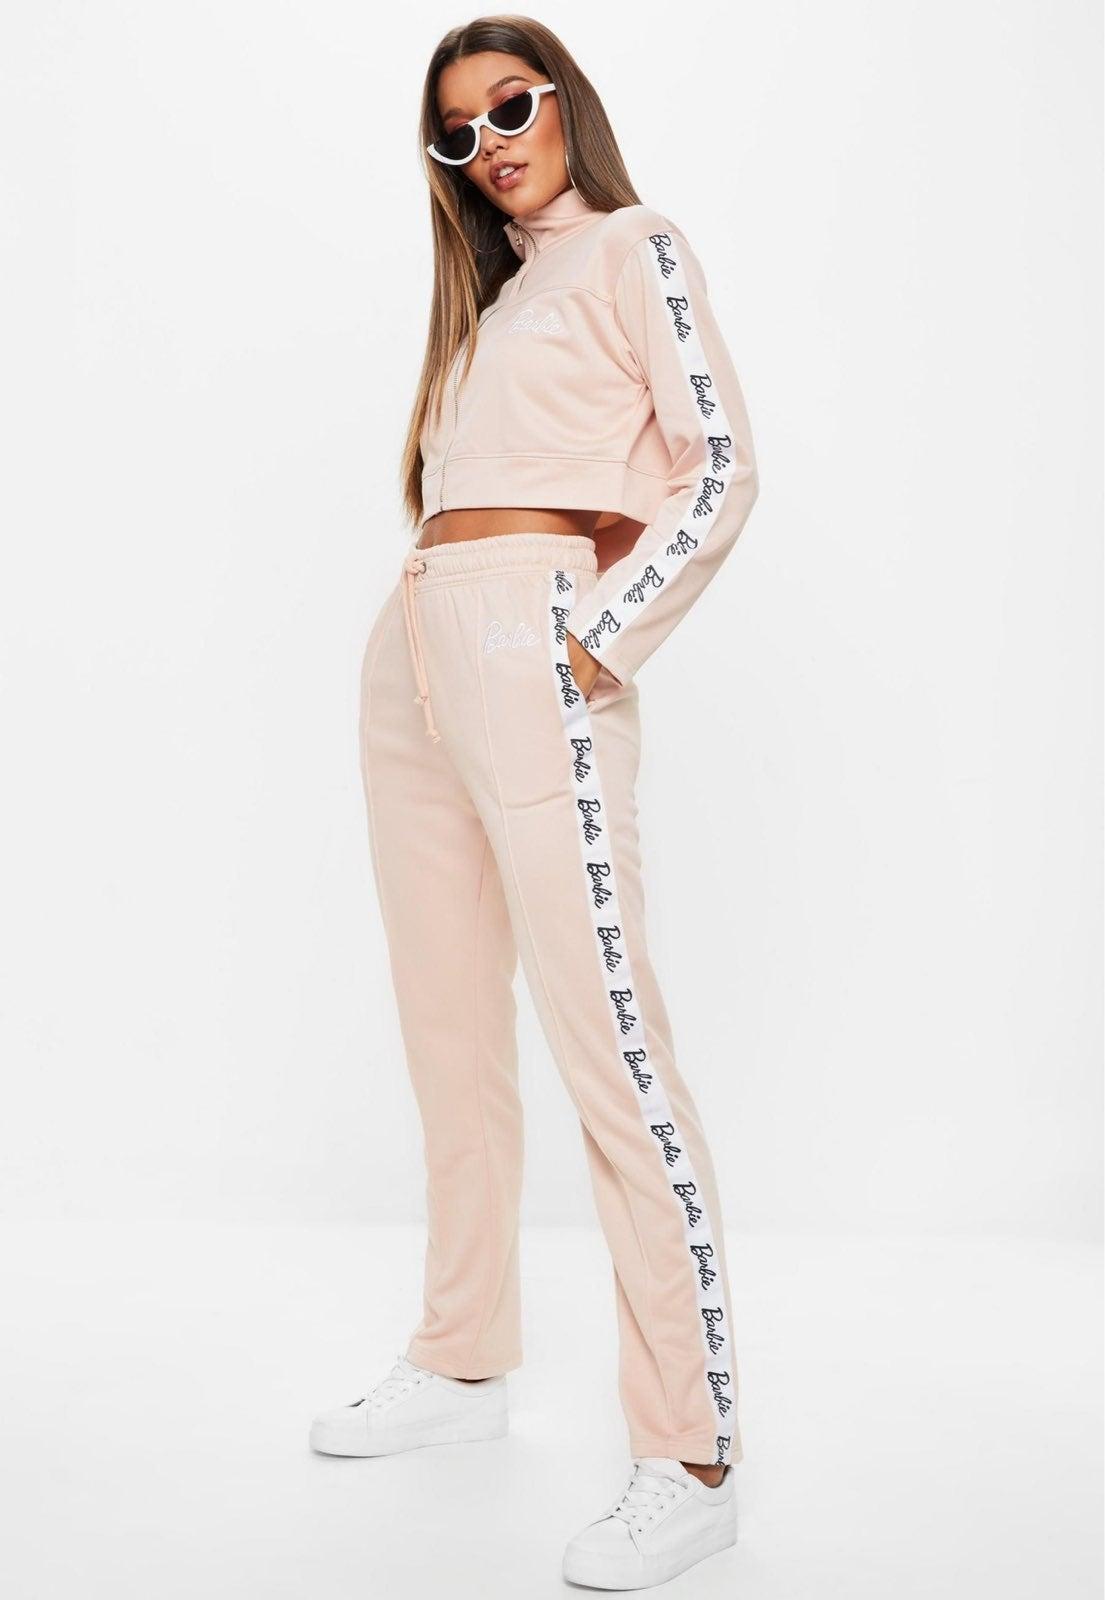 Missguided X Barbie stripe track Pants